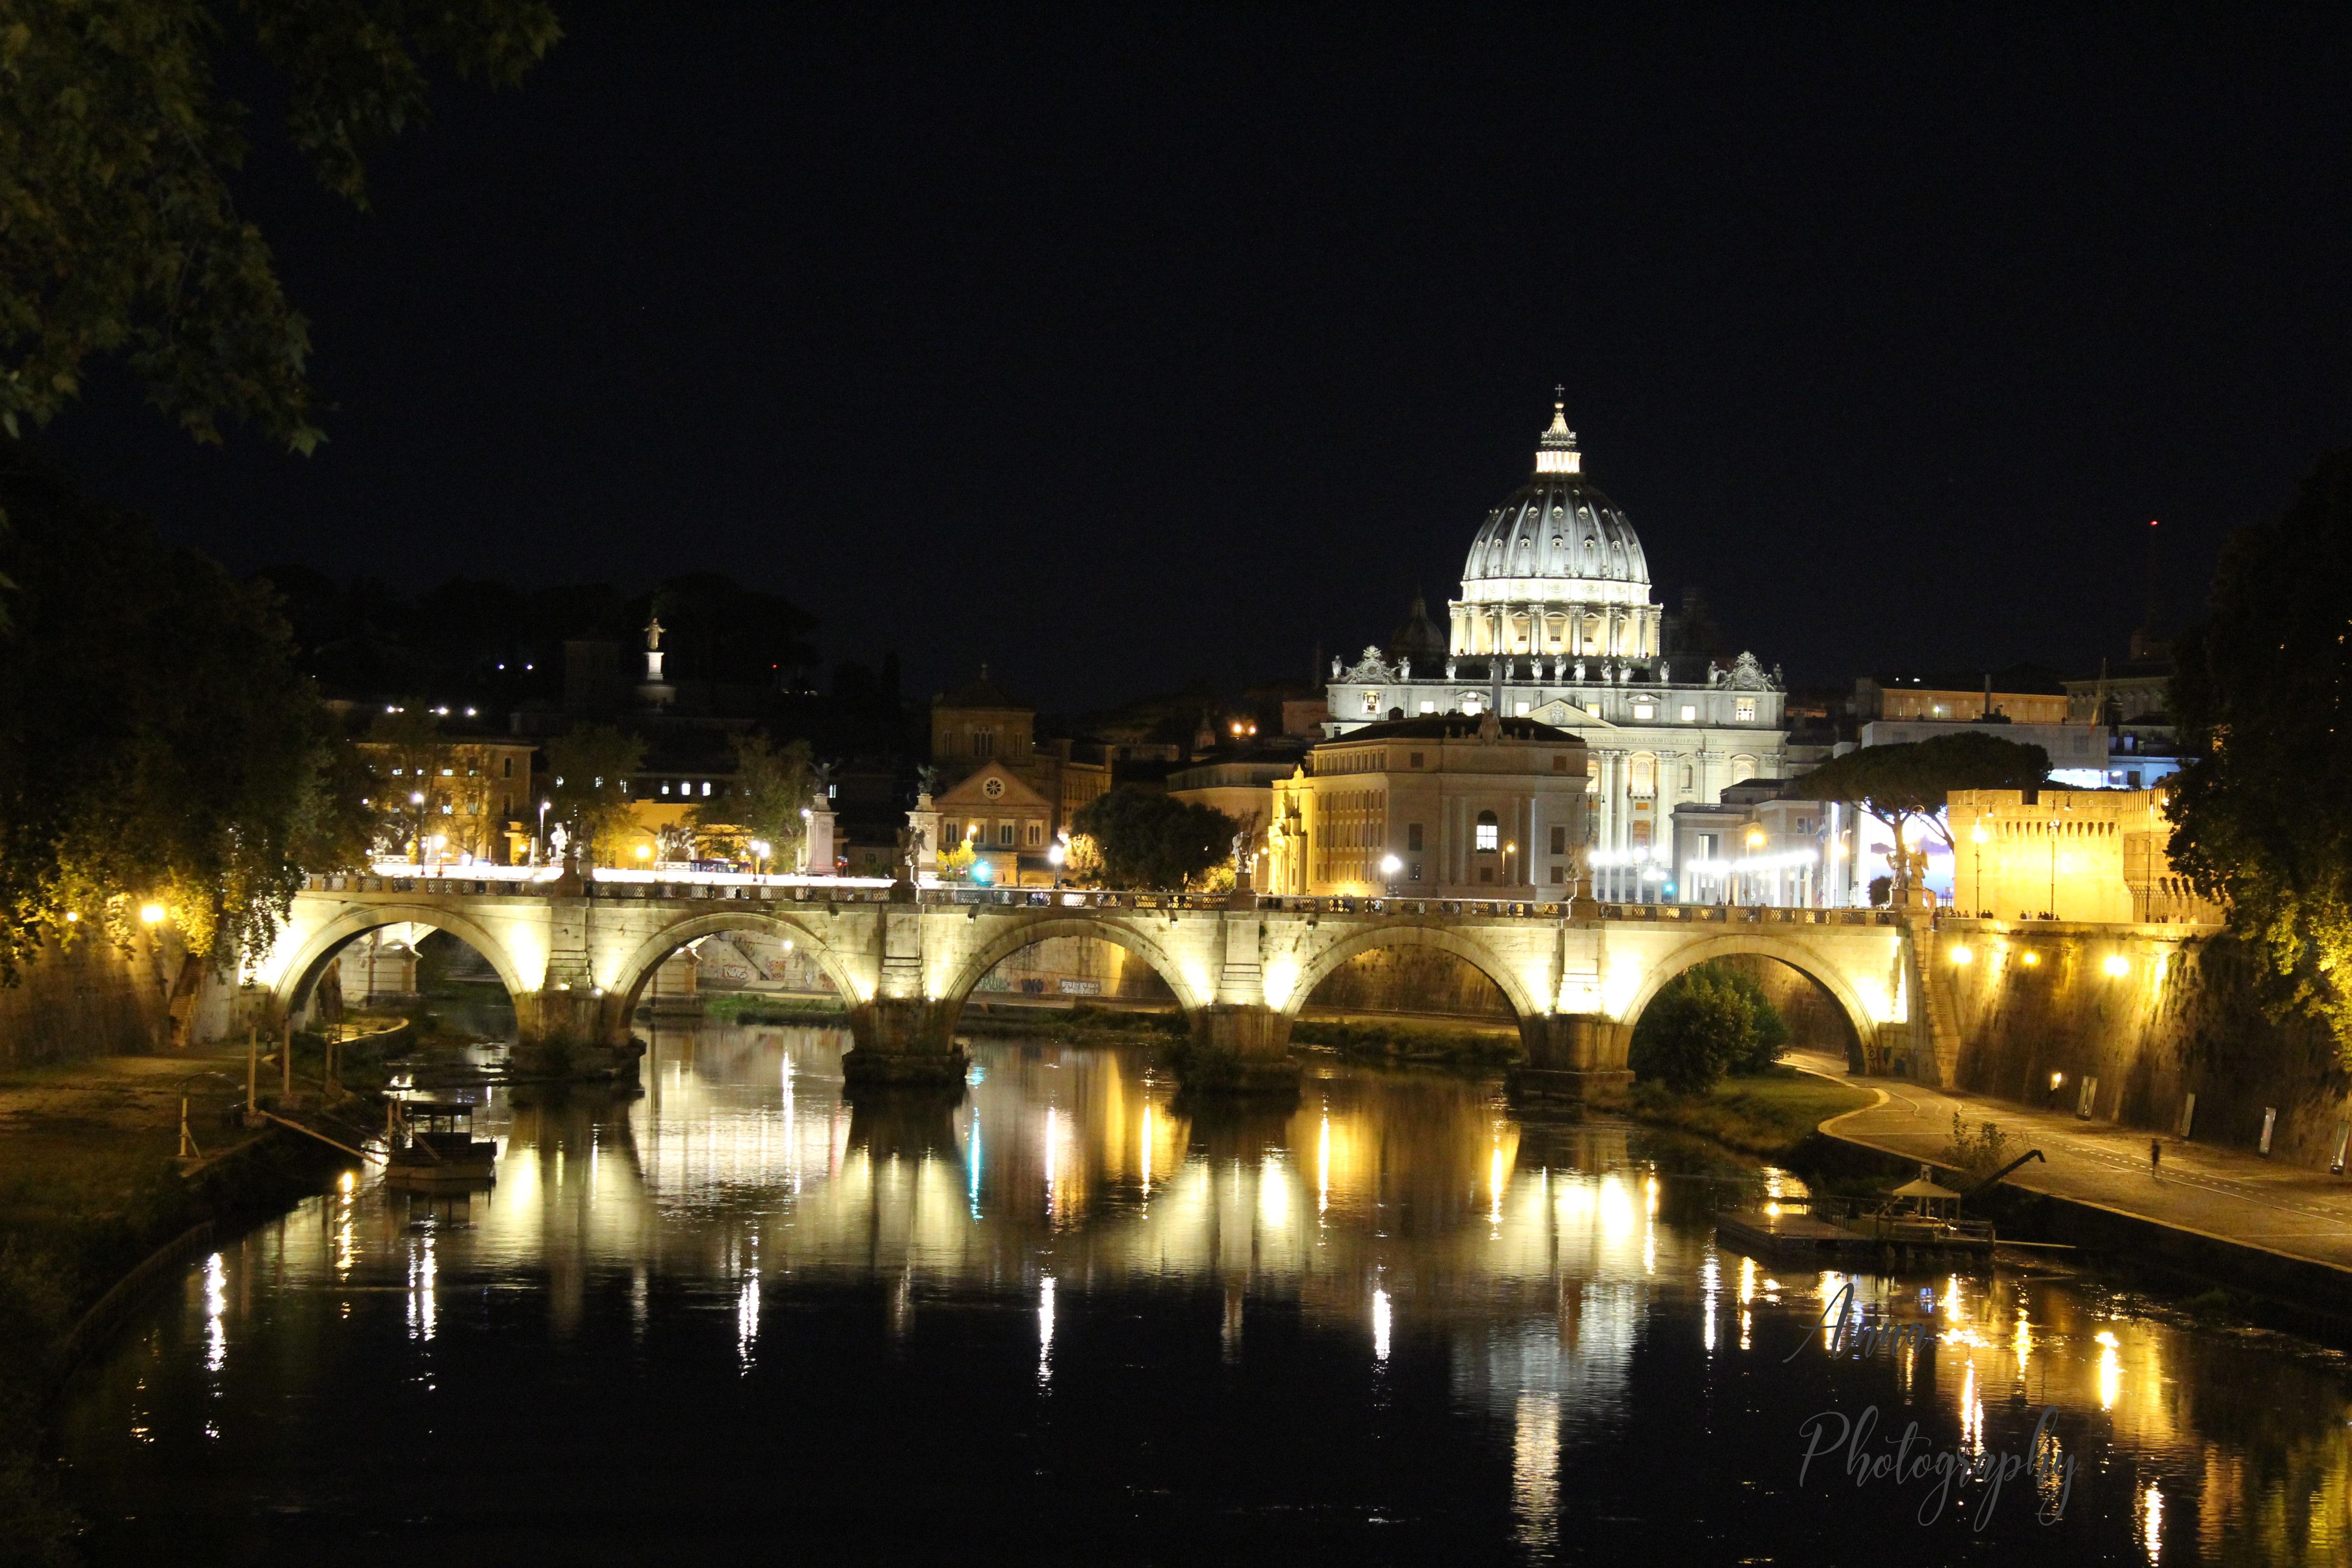 Vatican Bridge at Night example image 1